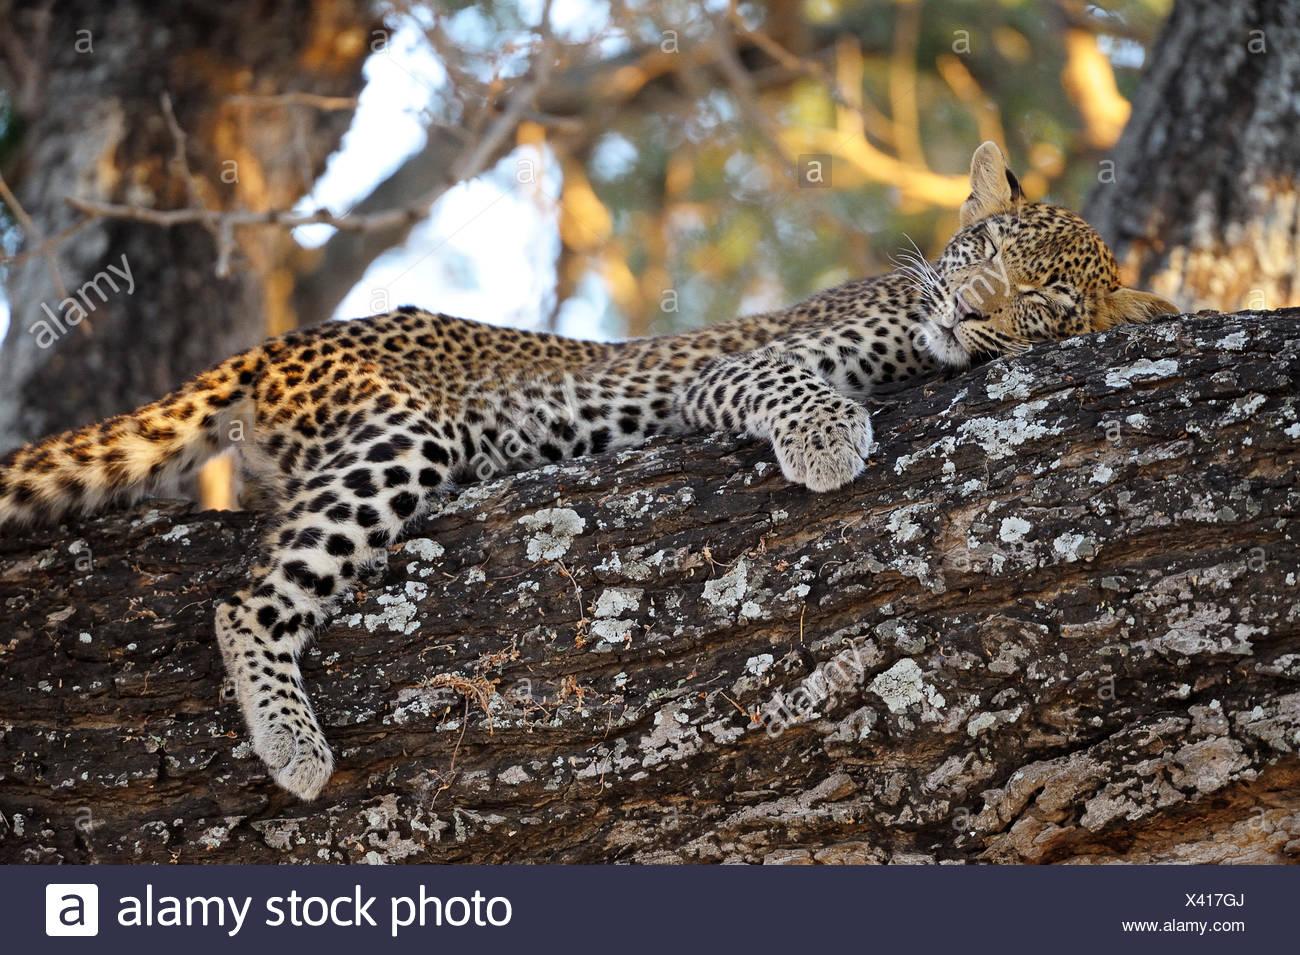 el-leopardo-panthera-pardus-dormir-cub-en-un-arbol-bajo-zambezi-national-park-zambia-x417gj.jpg